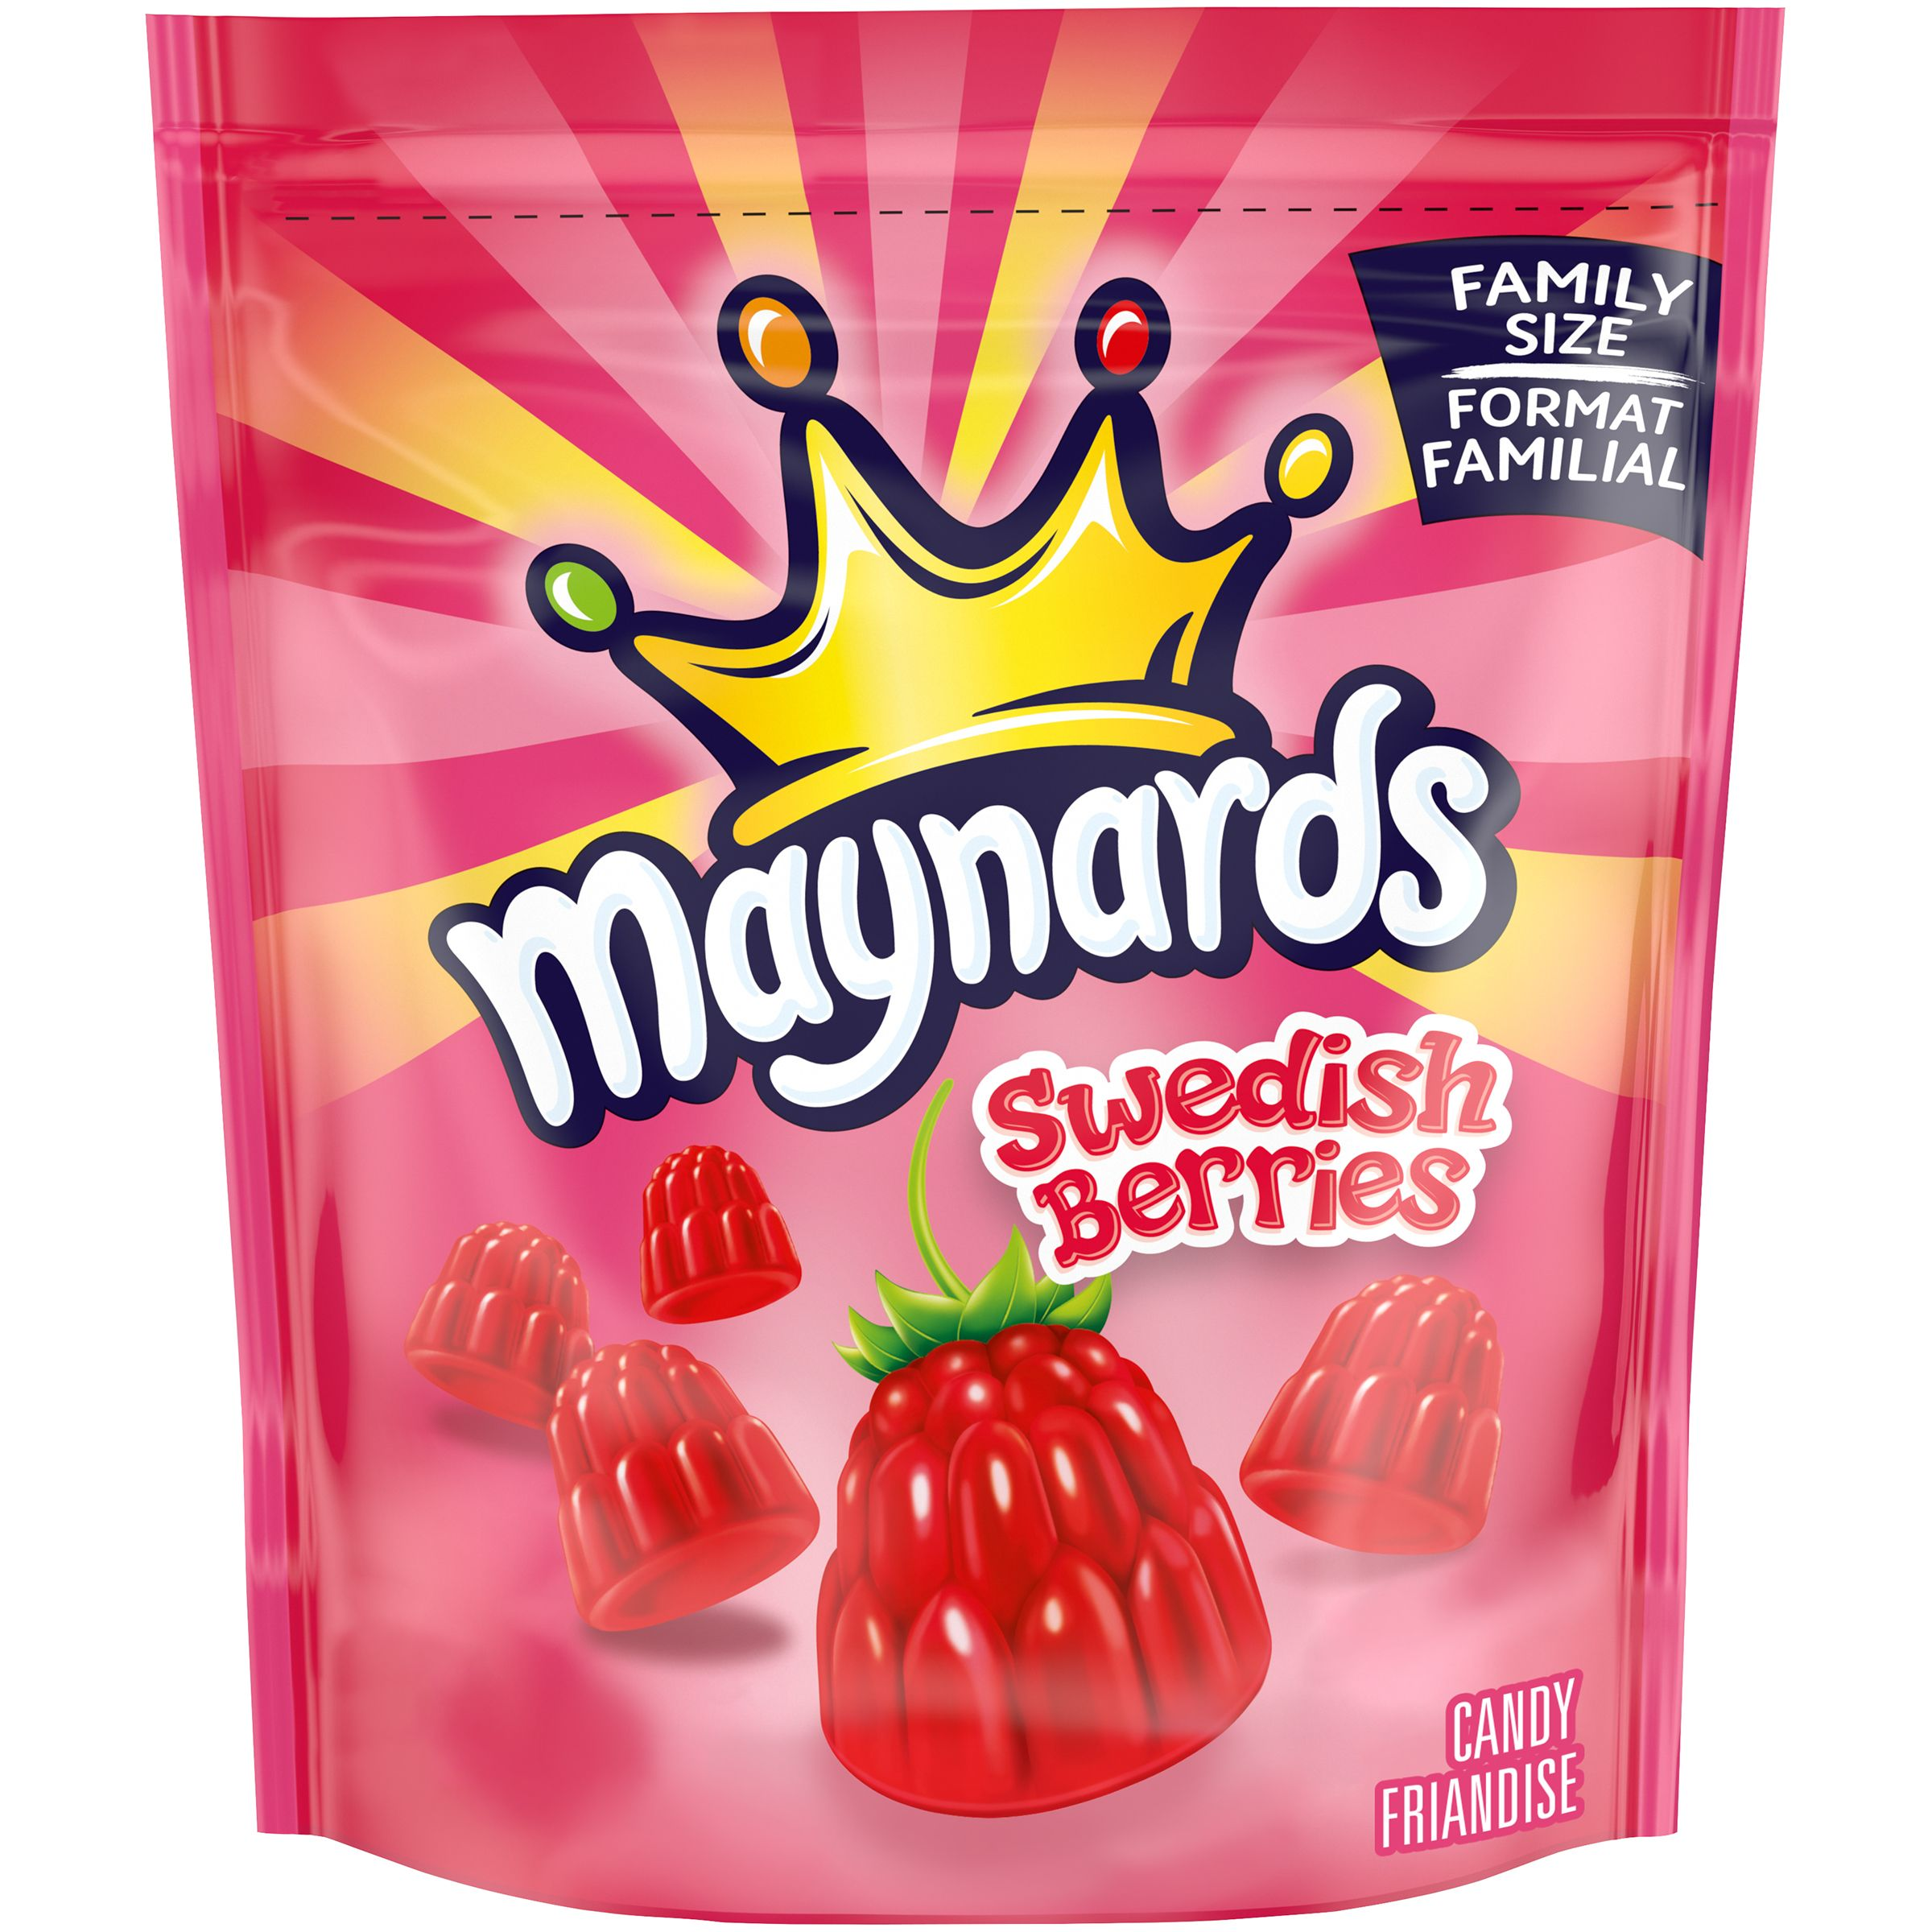 Maynards Swedish Berries Soft Candy 816 G